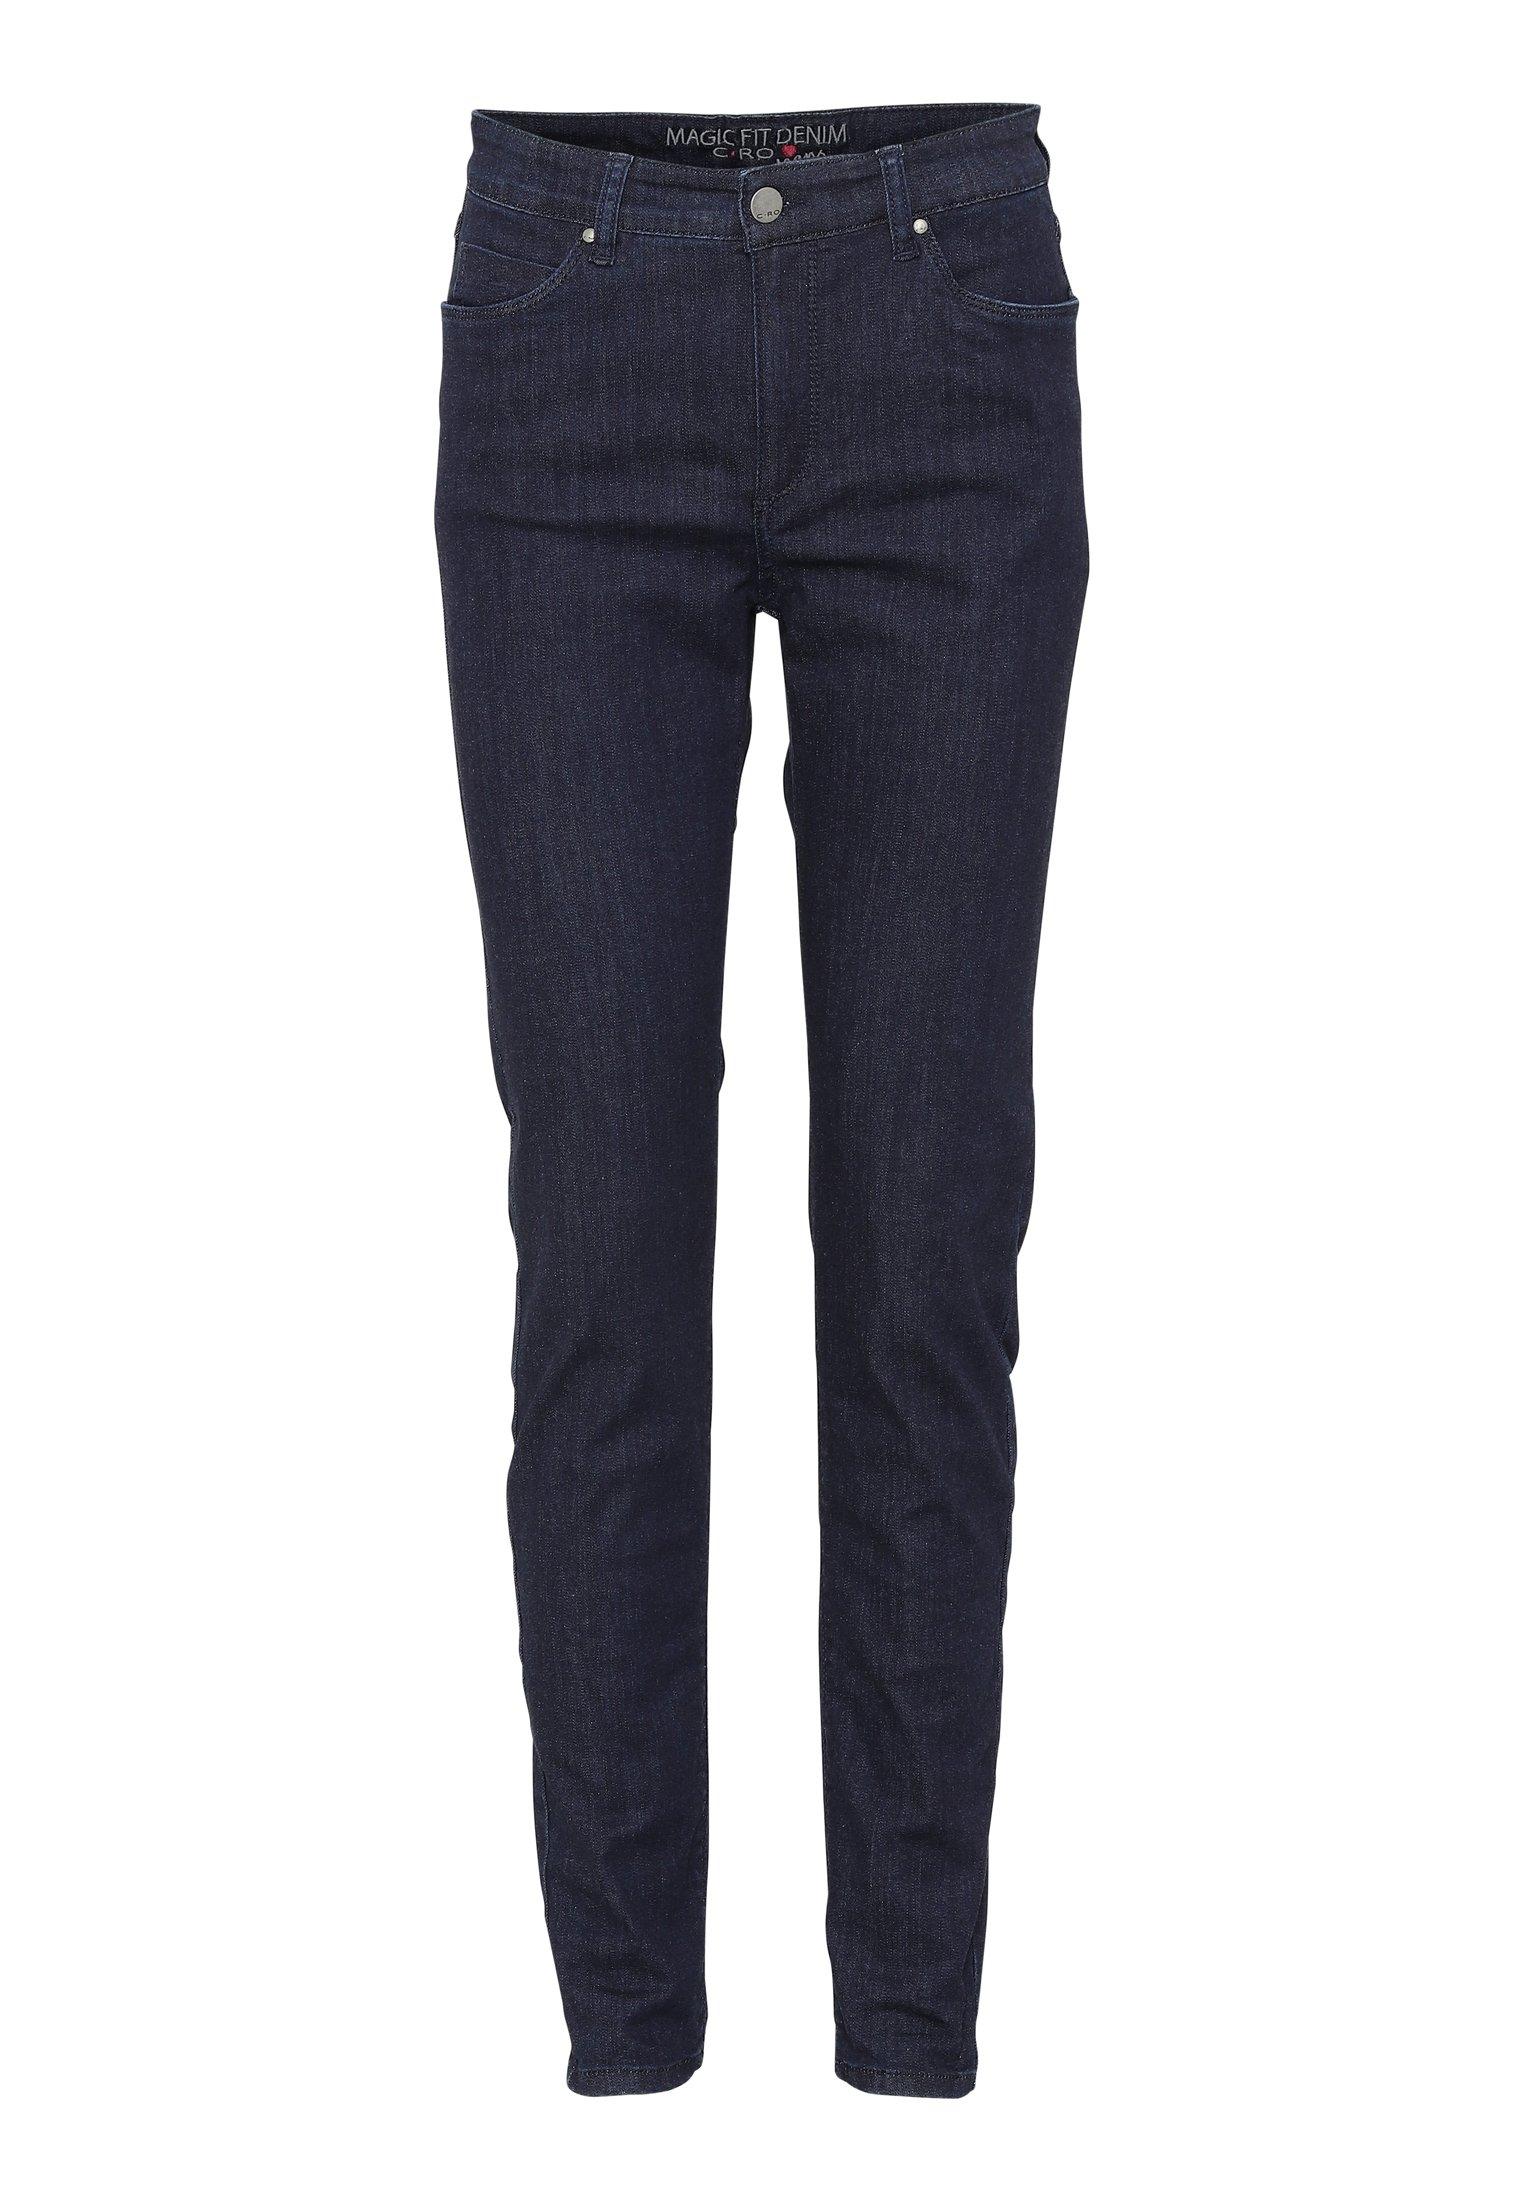 Cero & Etage Slim Fit -farkut - Dark Blue Denim